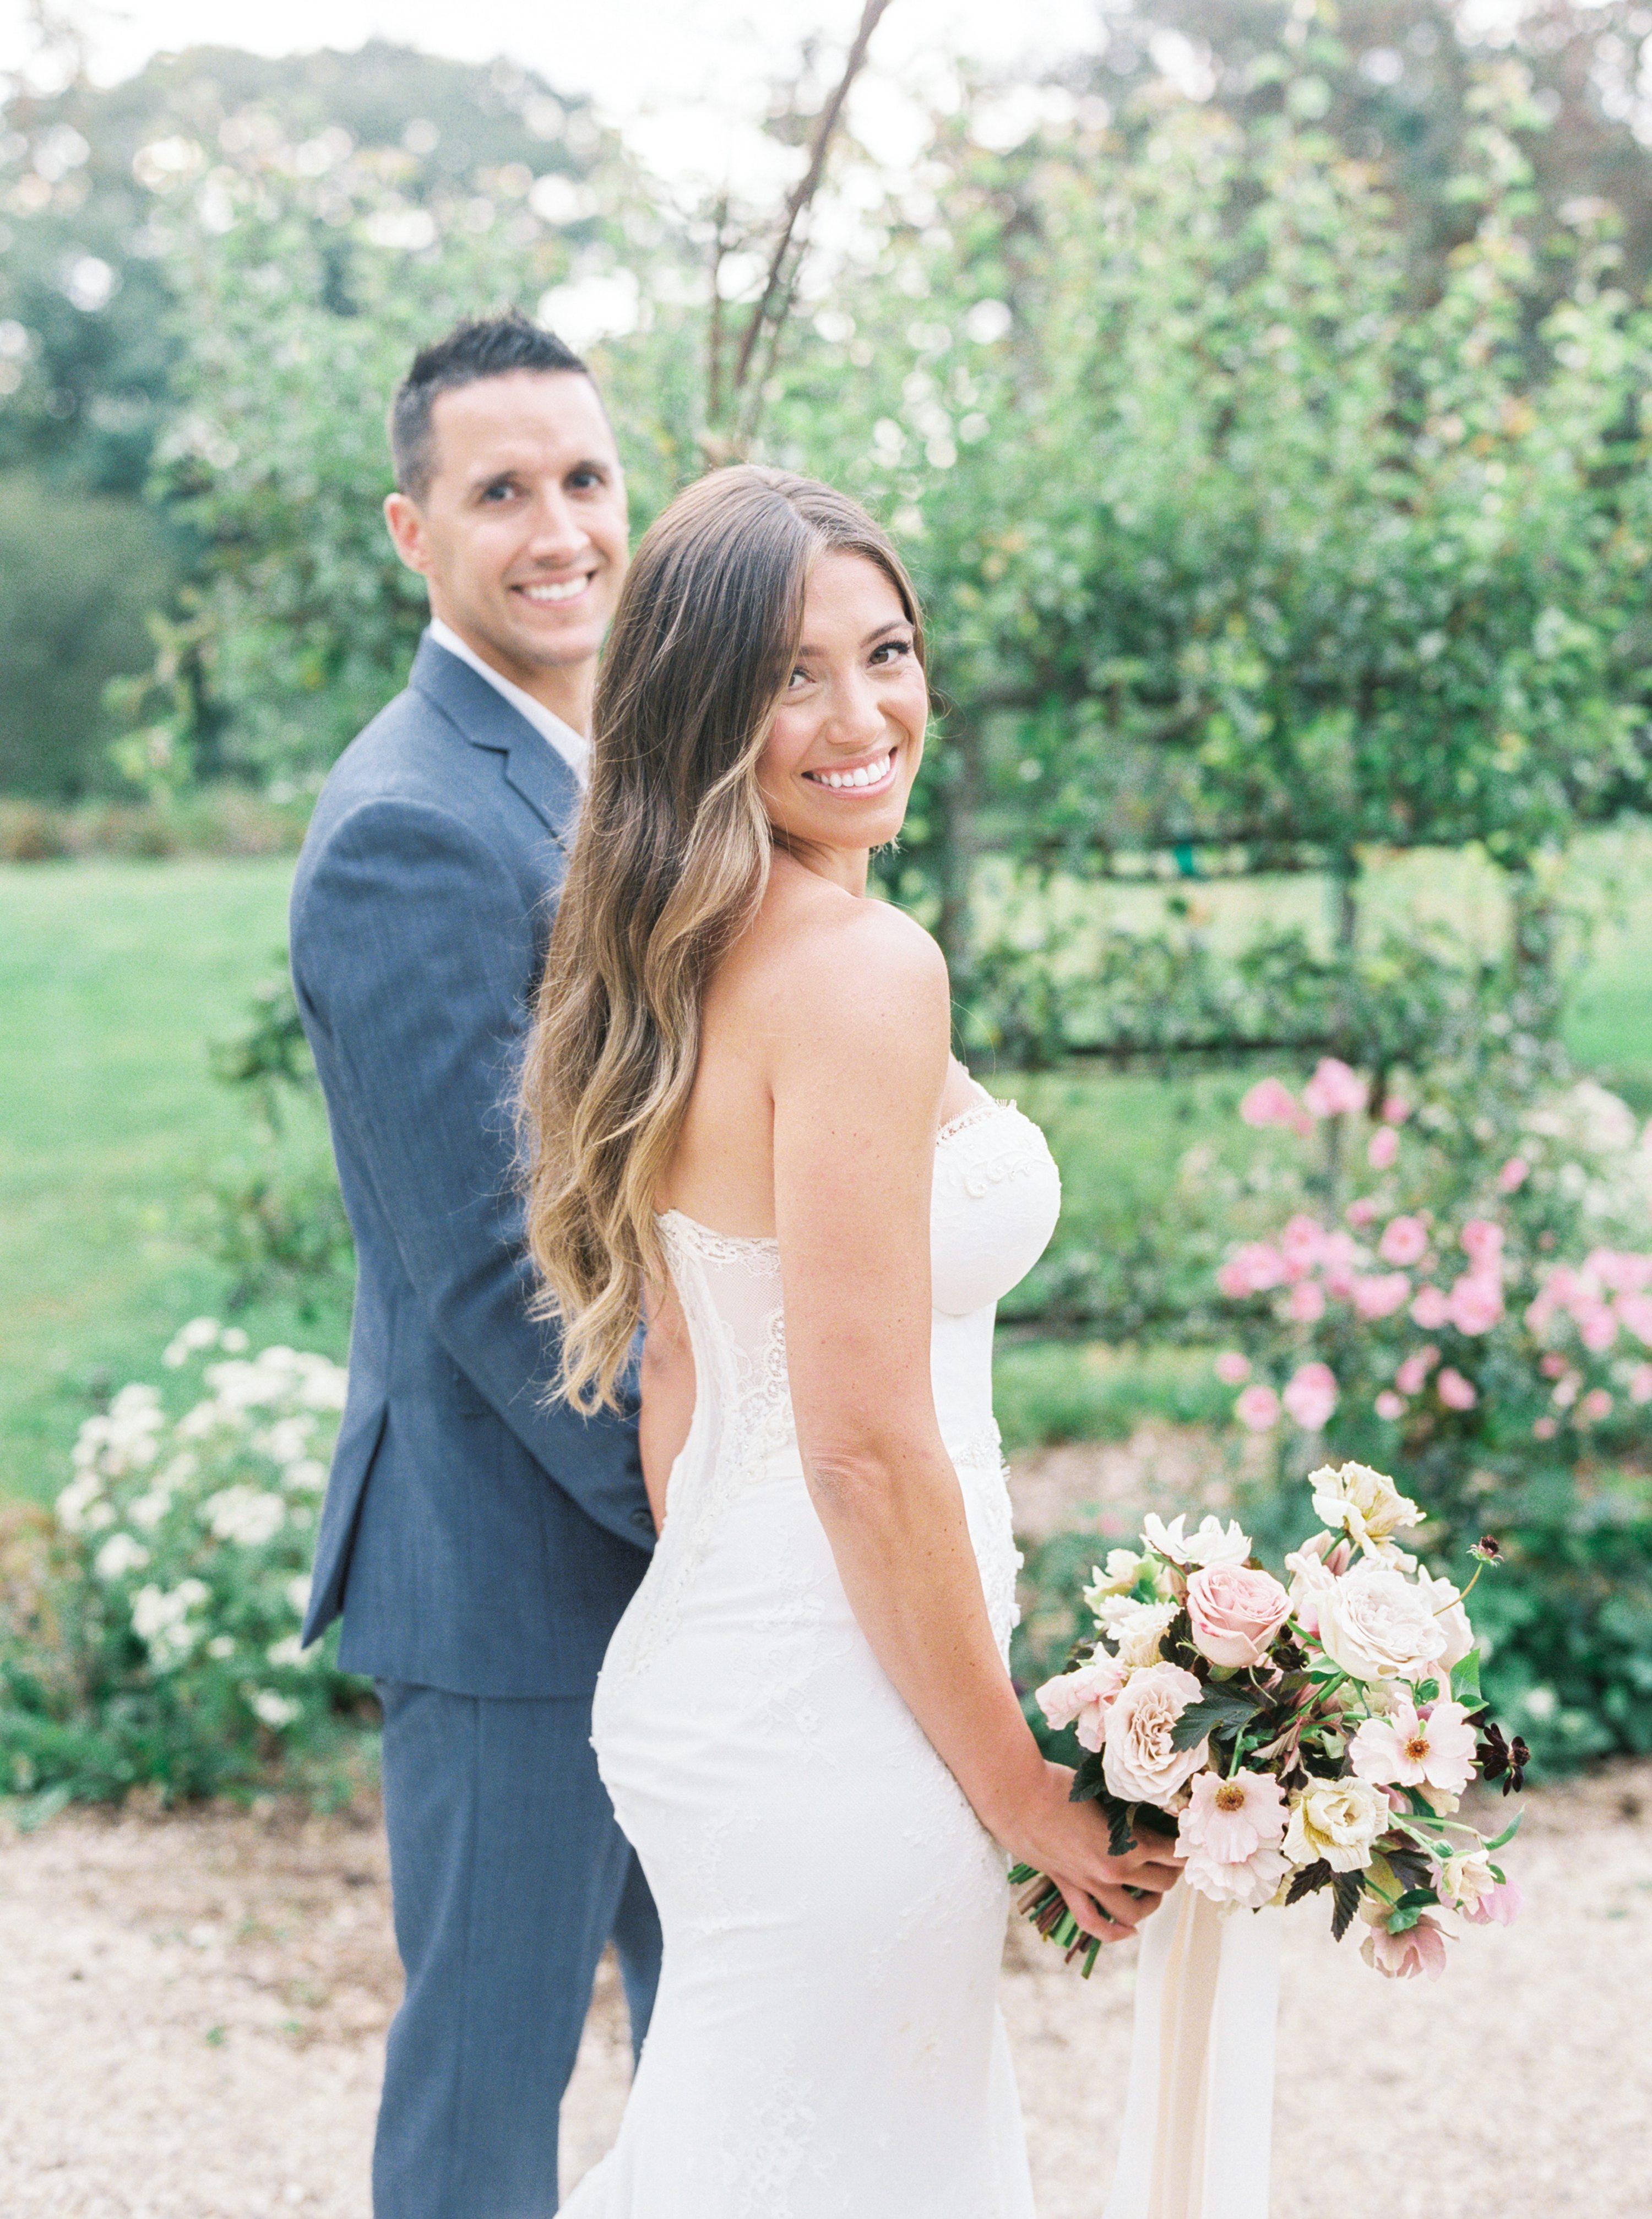 PLanting Fields Arboretum Engagement Photos,Hamptons Wedding Photographer